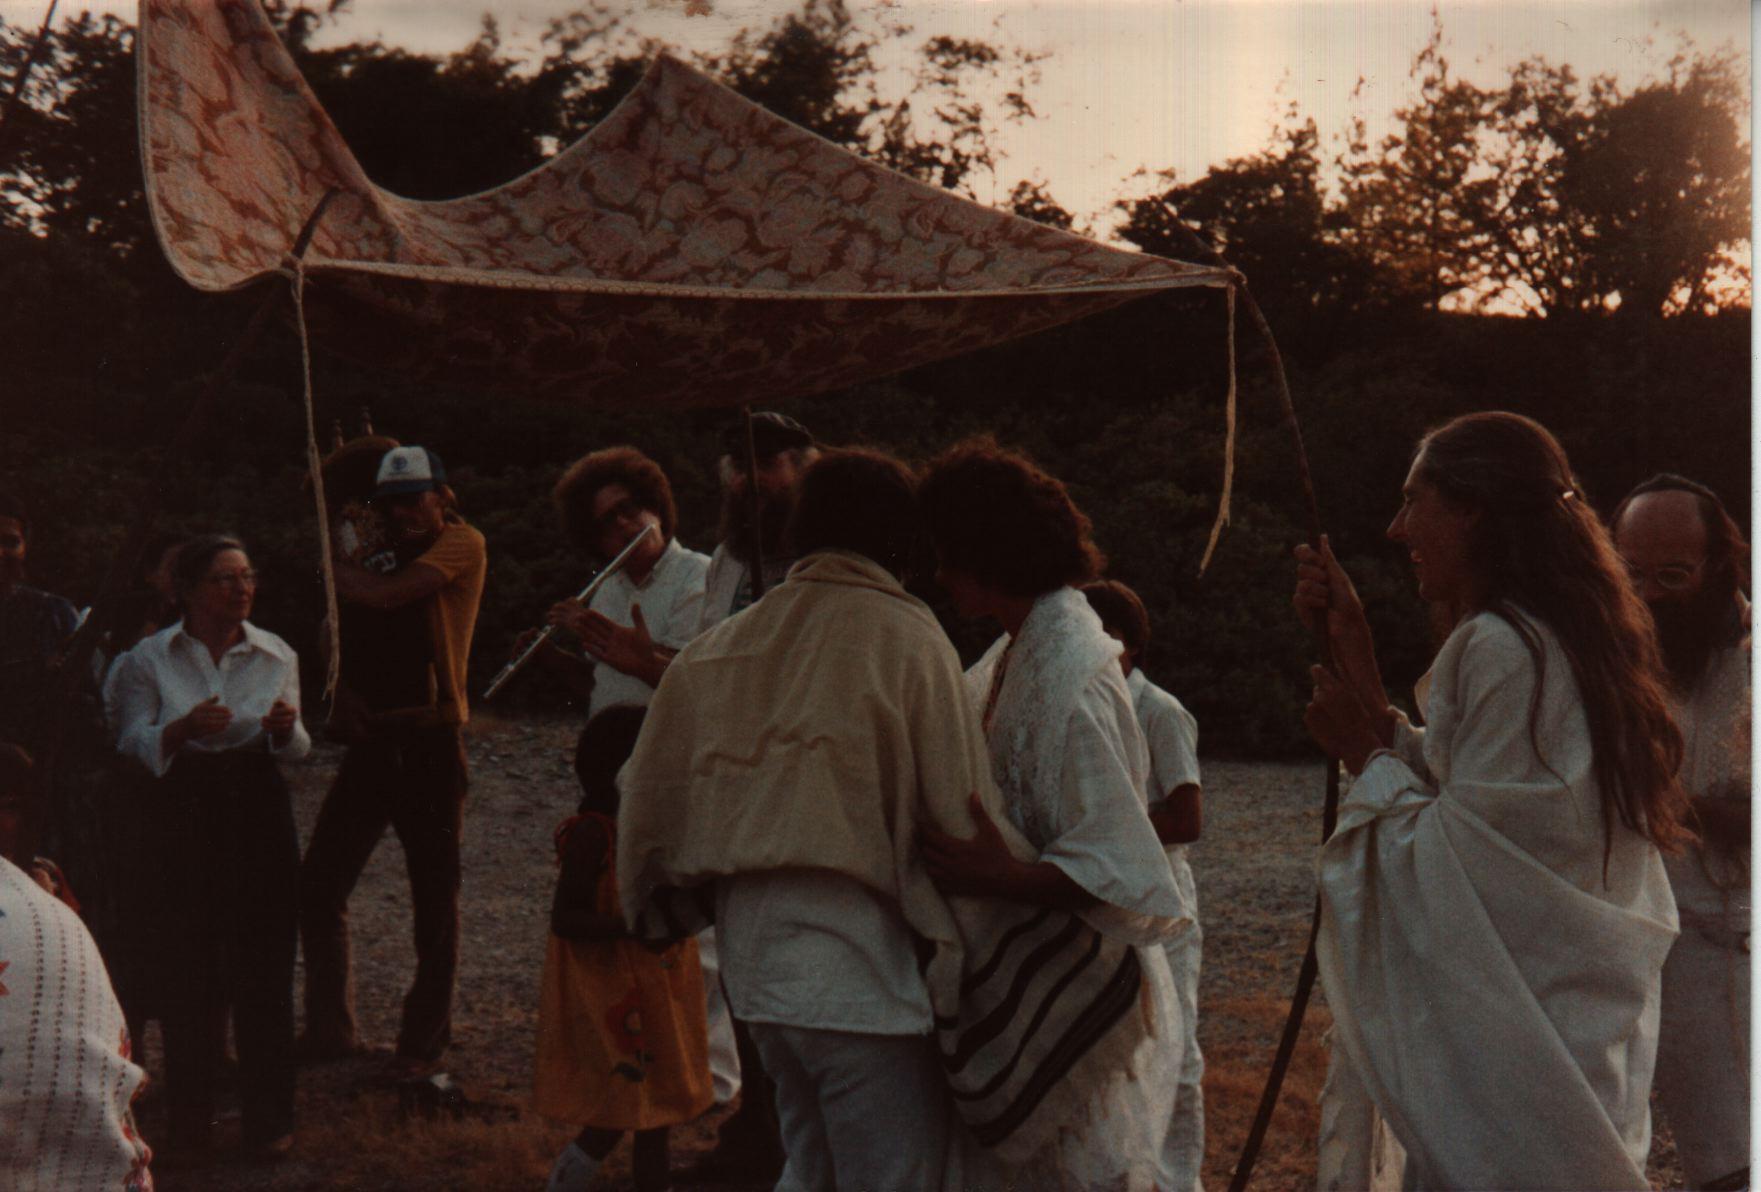 83 Joys  Huppah for Carol Goodman and Hanan Sills, incl Reuven and Yehudit Goldfarb, Juliet Lowenthal, Michael Diamond with Aquarian Minyan Torah, Aryeh Trupin on flute copy.jpg